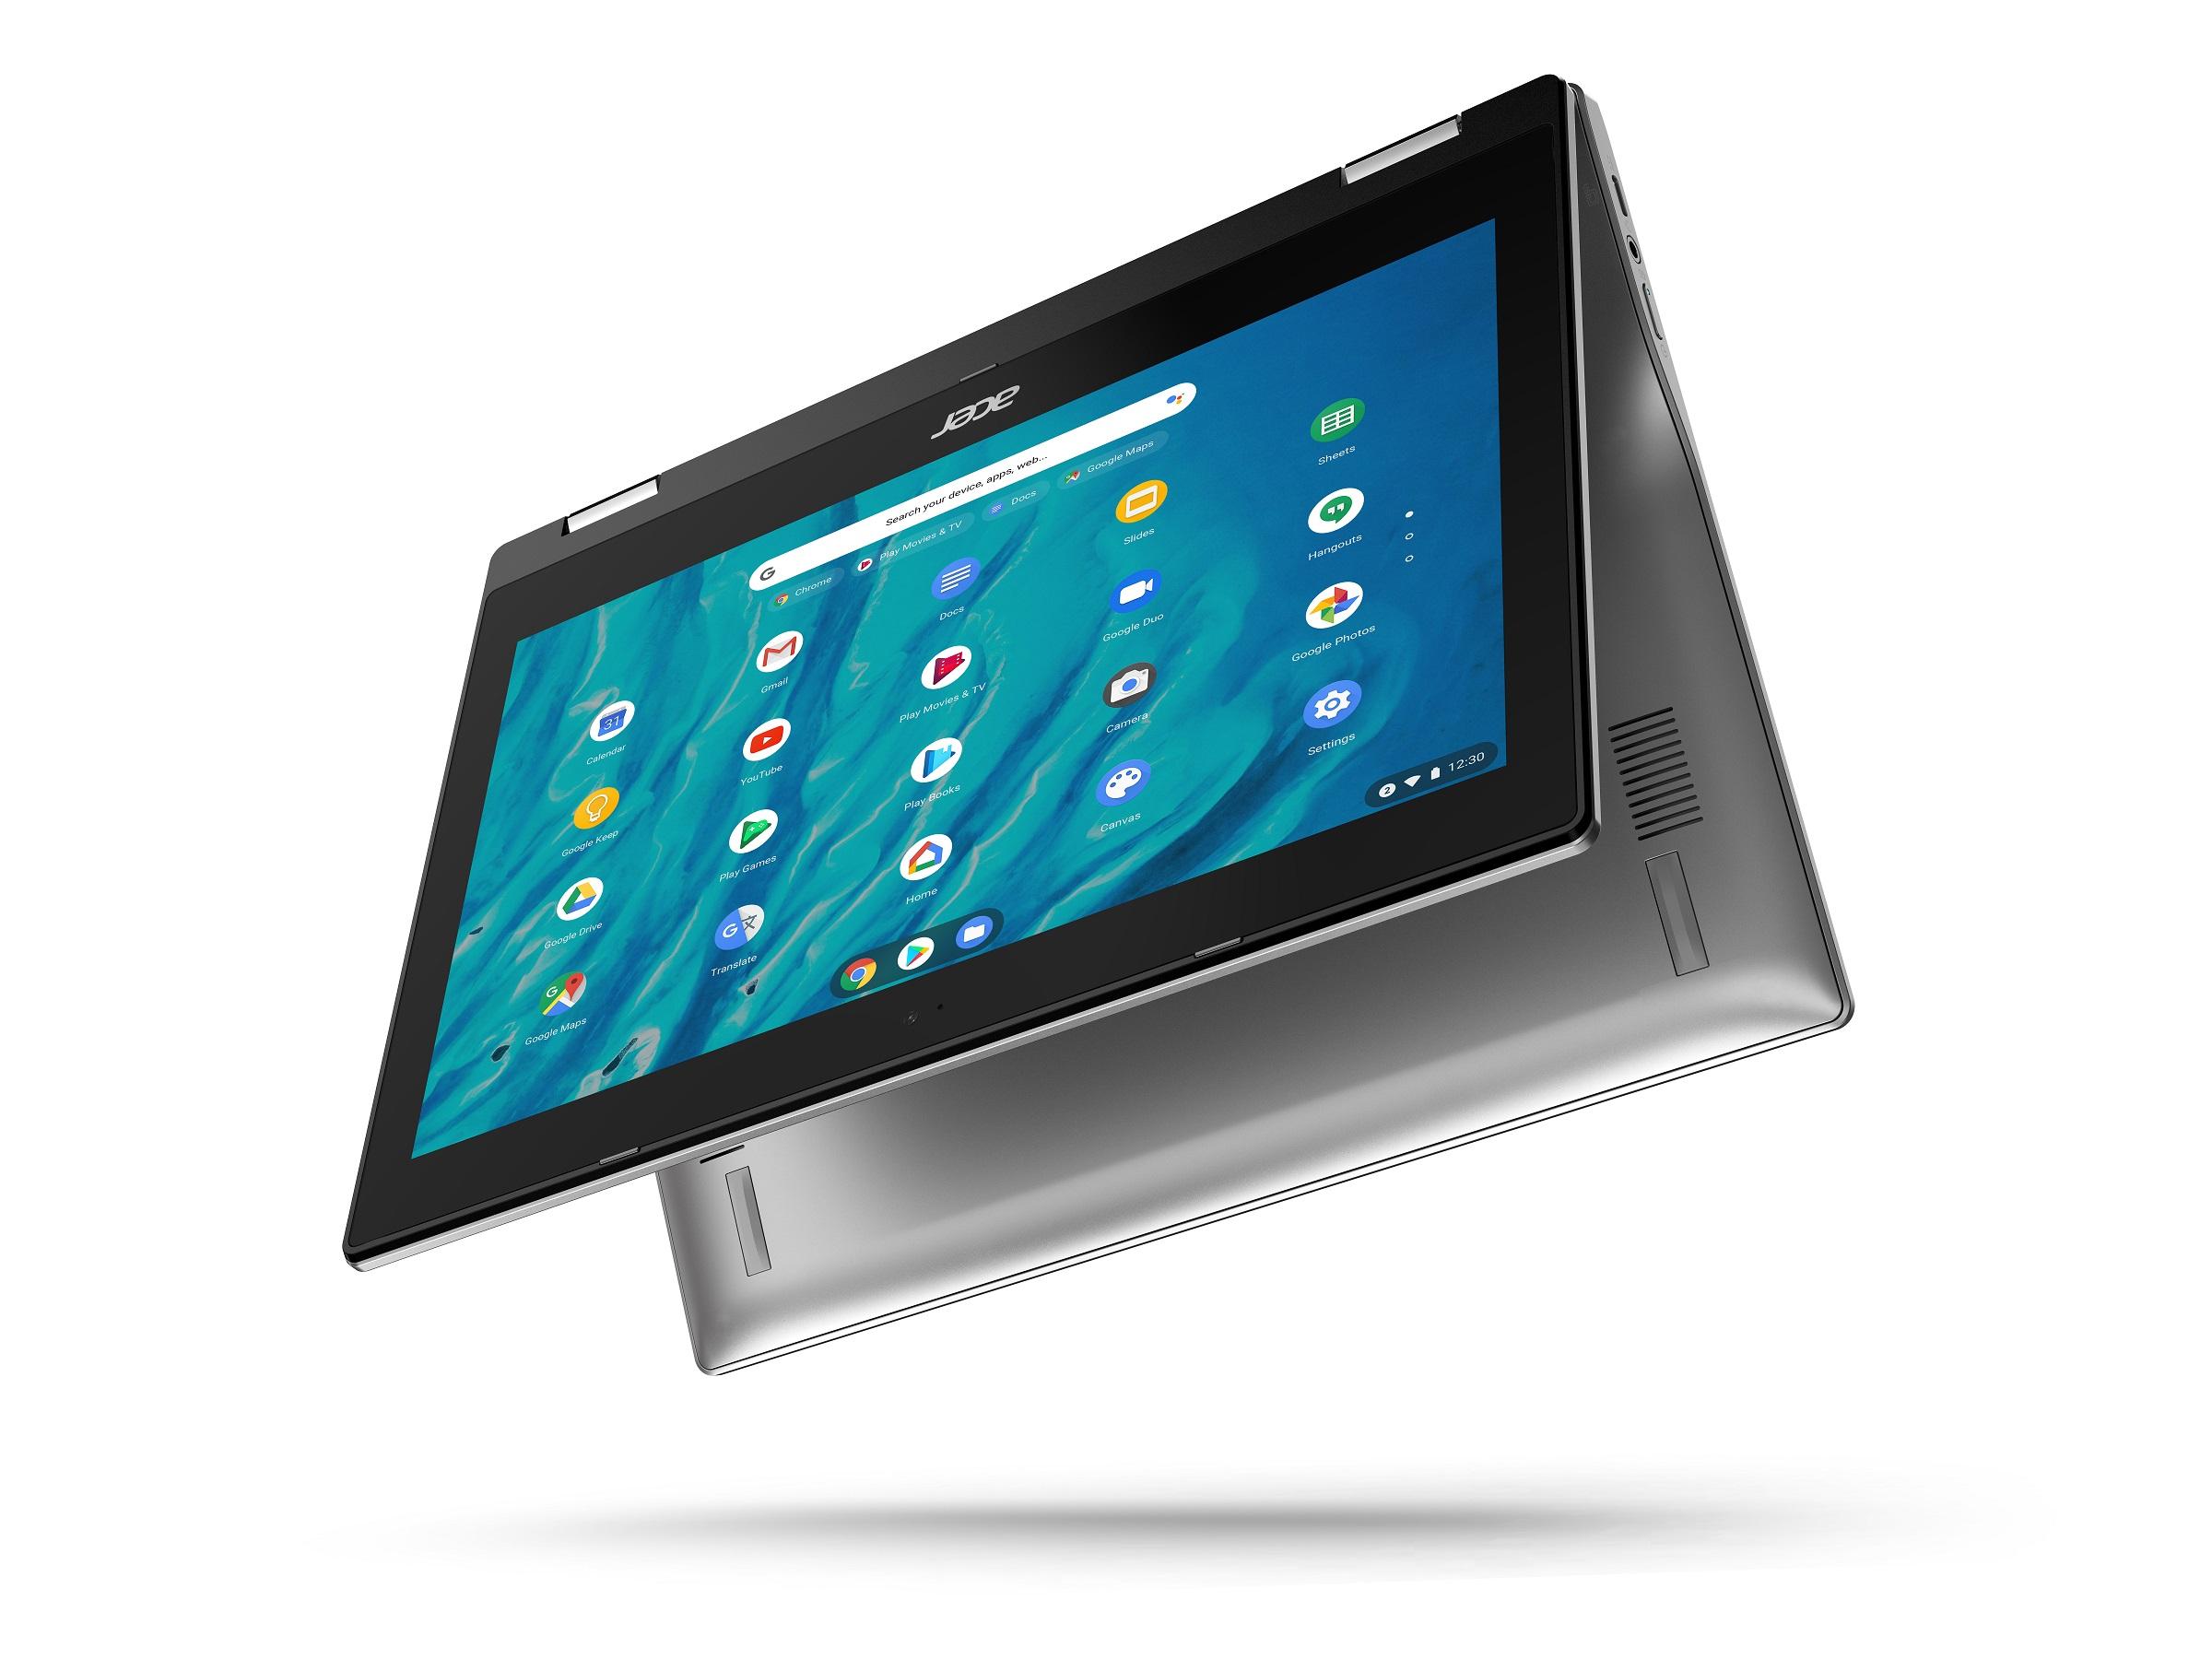 "YMMV Wal-Mart In-Store $54: Acer Chromebook Spin 311 CP311-3H-K3WL Convertible Laptop, MediaTek MT8183C Octa-Core Processor, 11.6"" HD Touchscreen, 4GB LPDDR4X, 32GB eMMC $54"